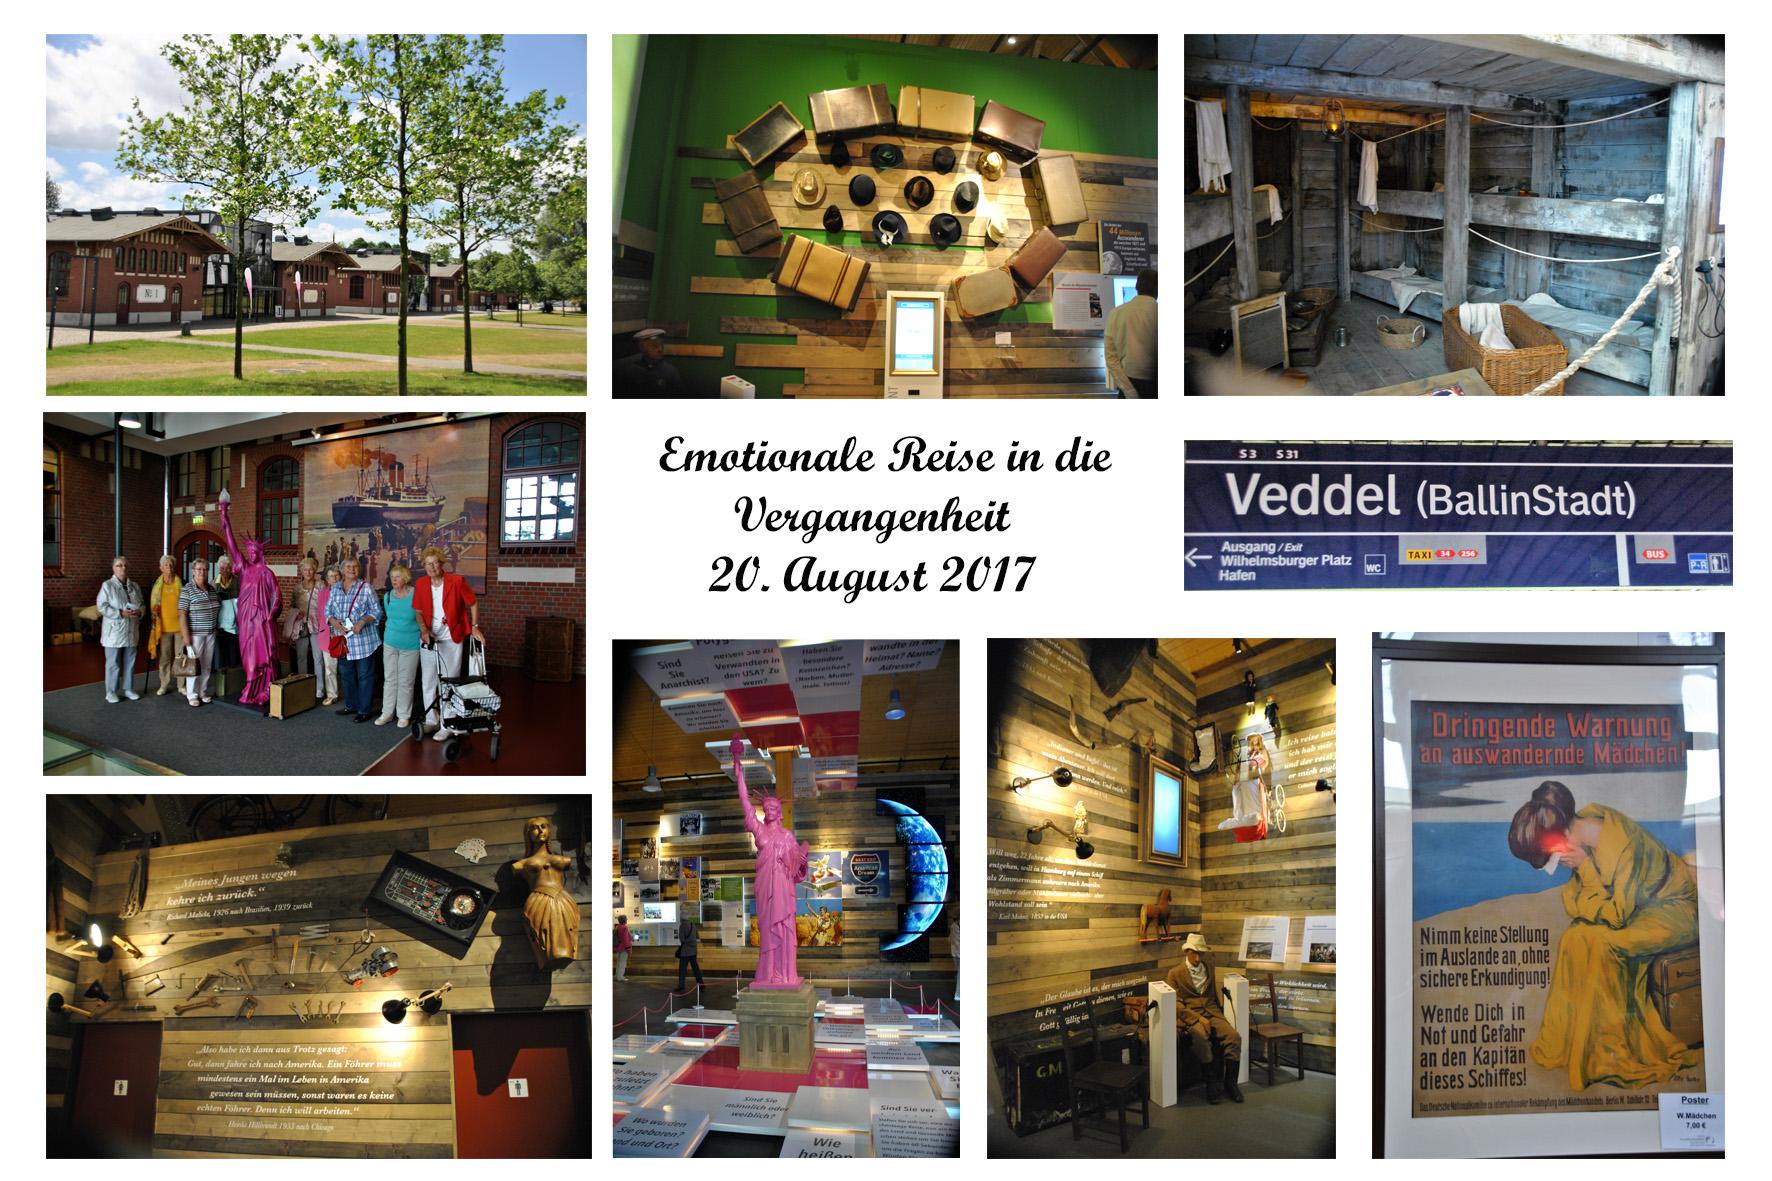 NeNo/Glashütte 2: Ballinstadt, 20.08.2017 (Fotos: Tom)